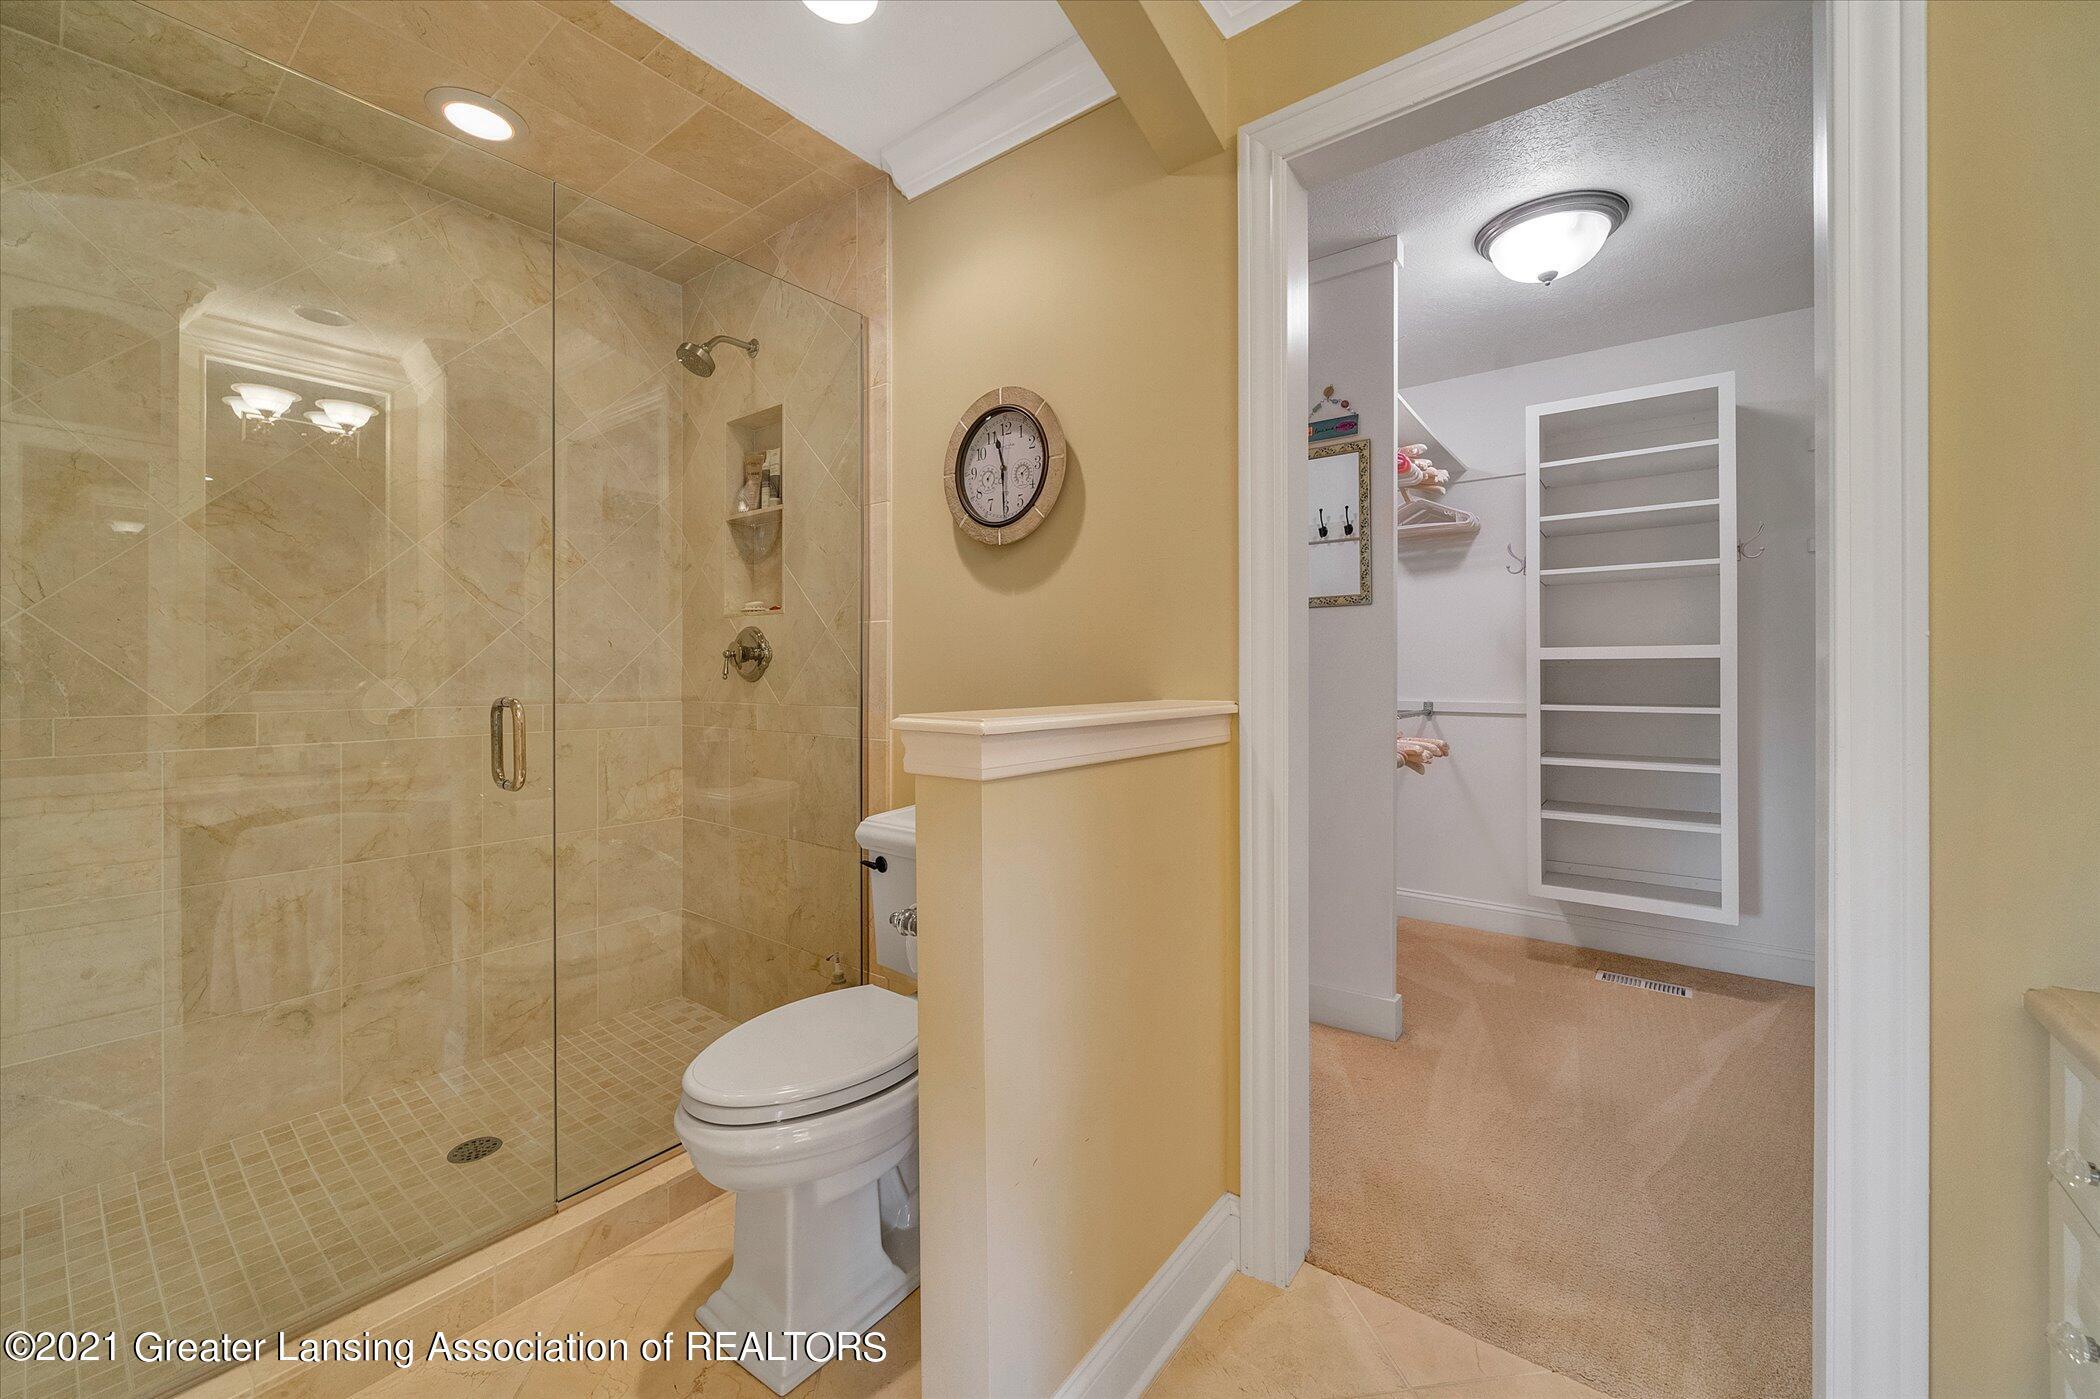 6330 Pine Hollow Dr - MAIN FLOOR Primary Bathroom - 30